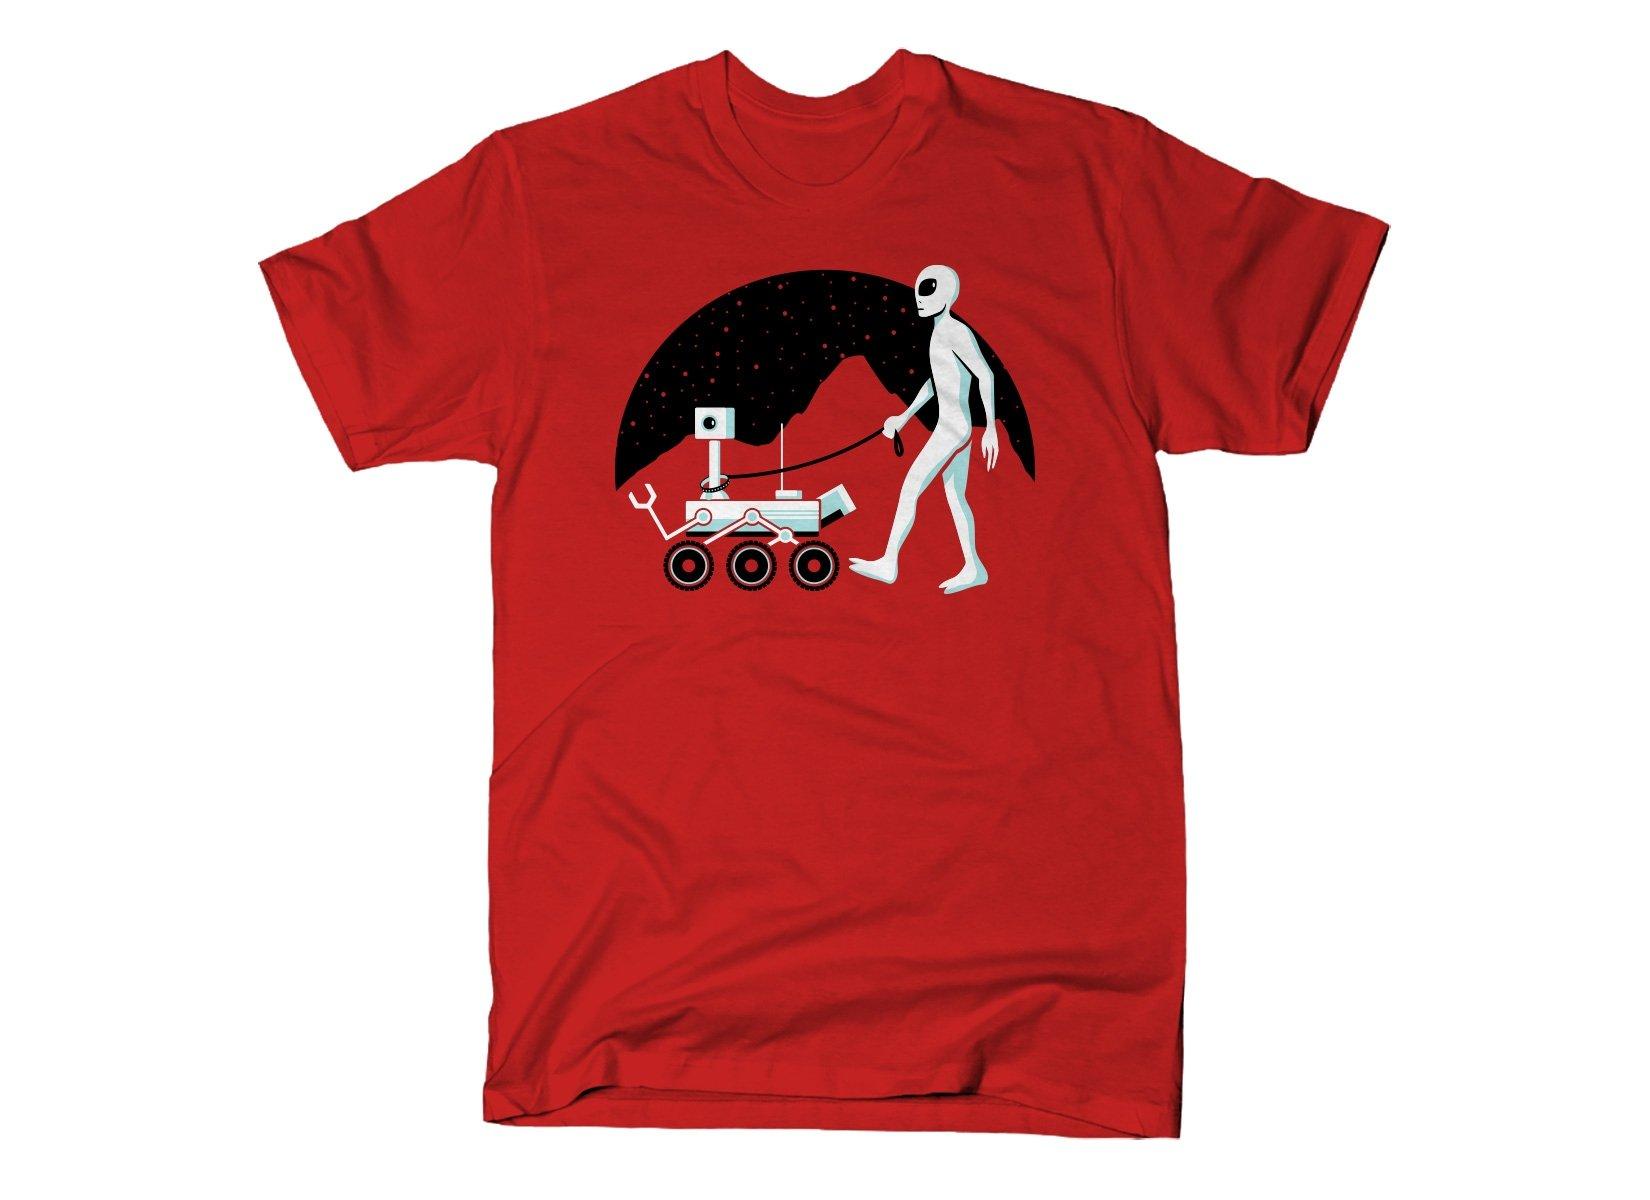 Mars Rover on Mens T-Shirt